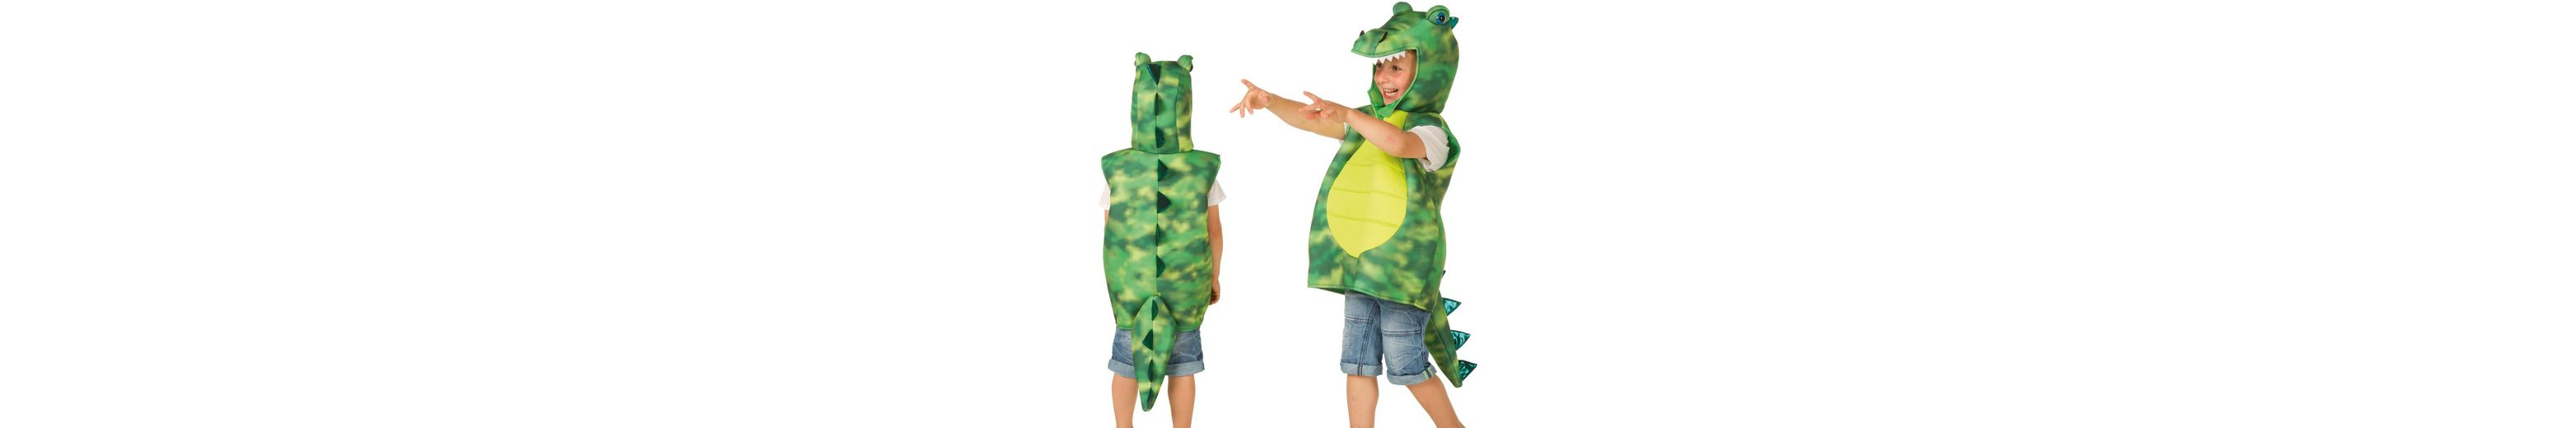 Heunec Karneval Kostüm für Kinder, Größe 128, »Kostüm-Weste Drache grün«